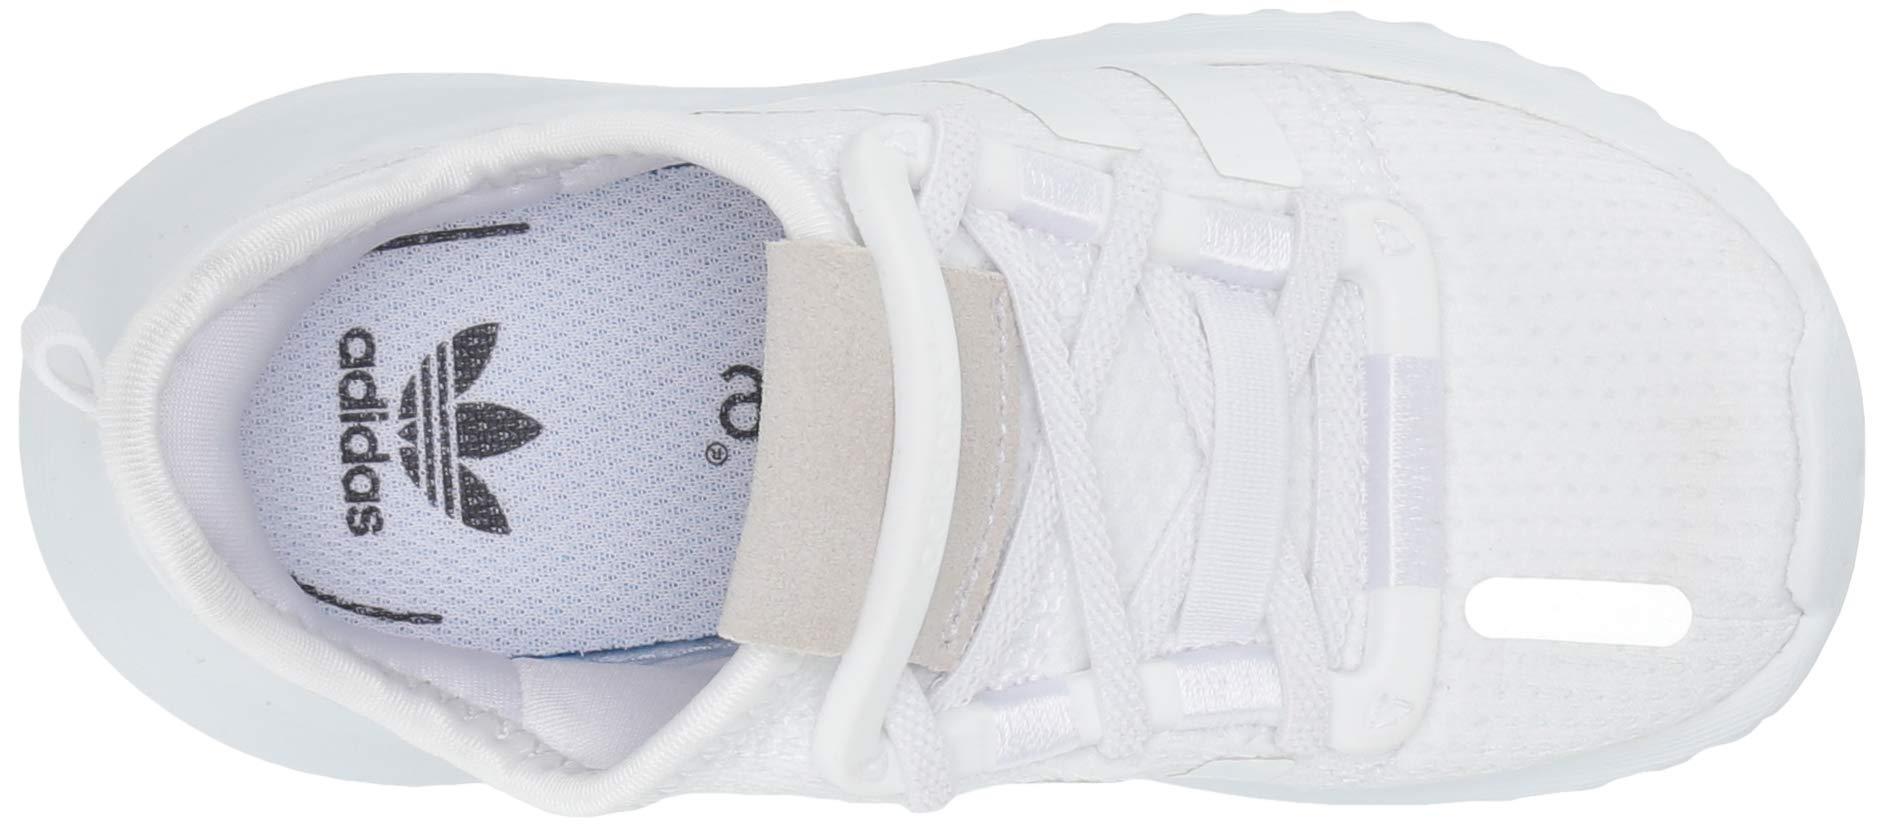 adidas Originals Baby U_Path Running Shoe White, 5.5K M US Toddler by adidas Originals (Image #7)